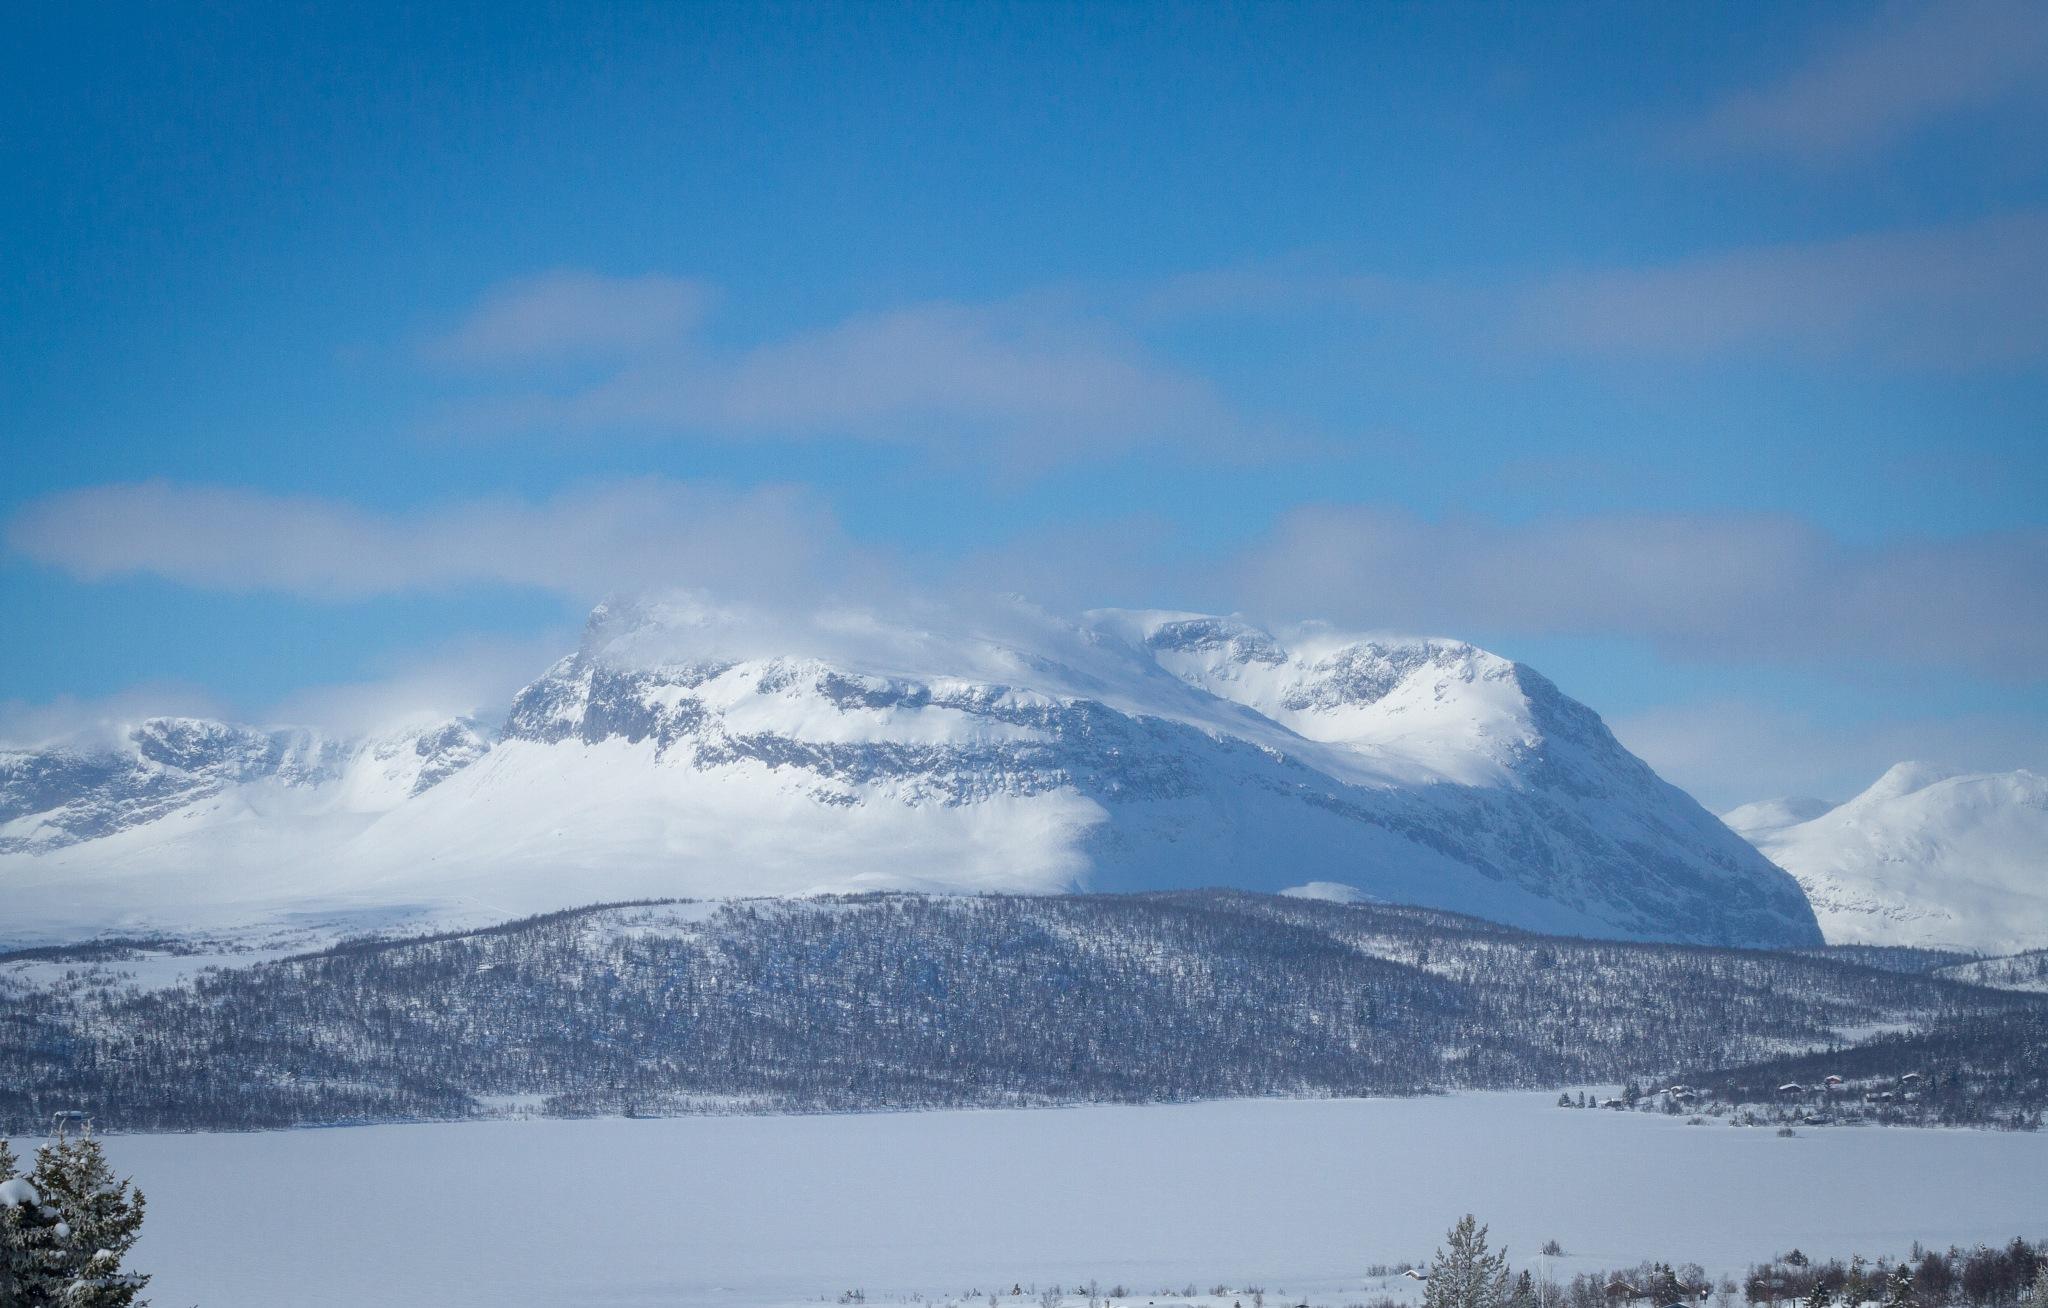 Grindafjell by Svein Erik Andresen